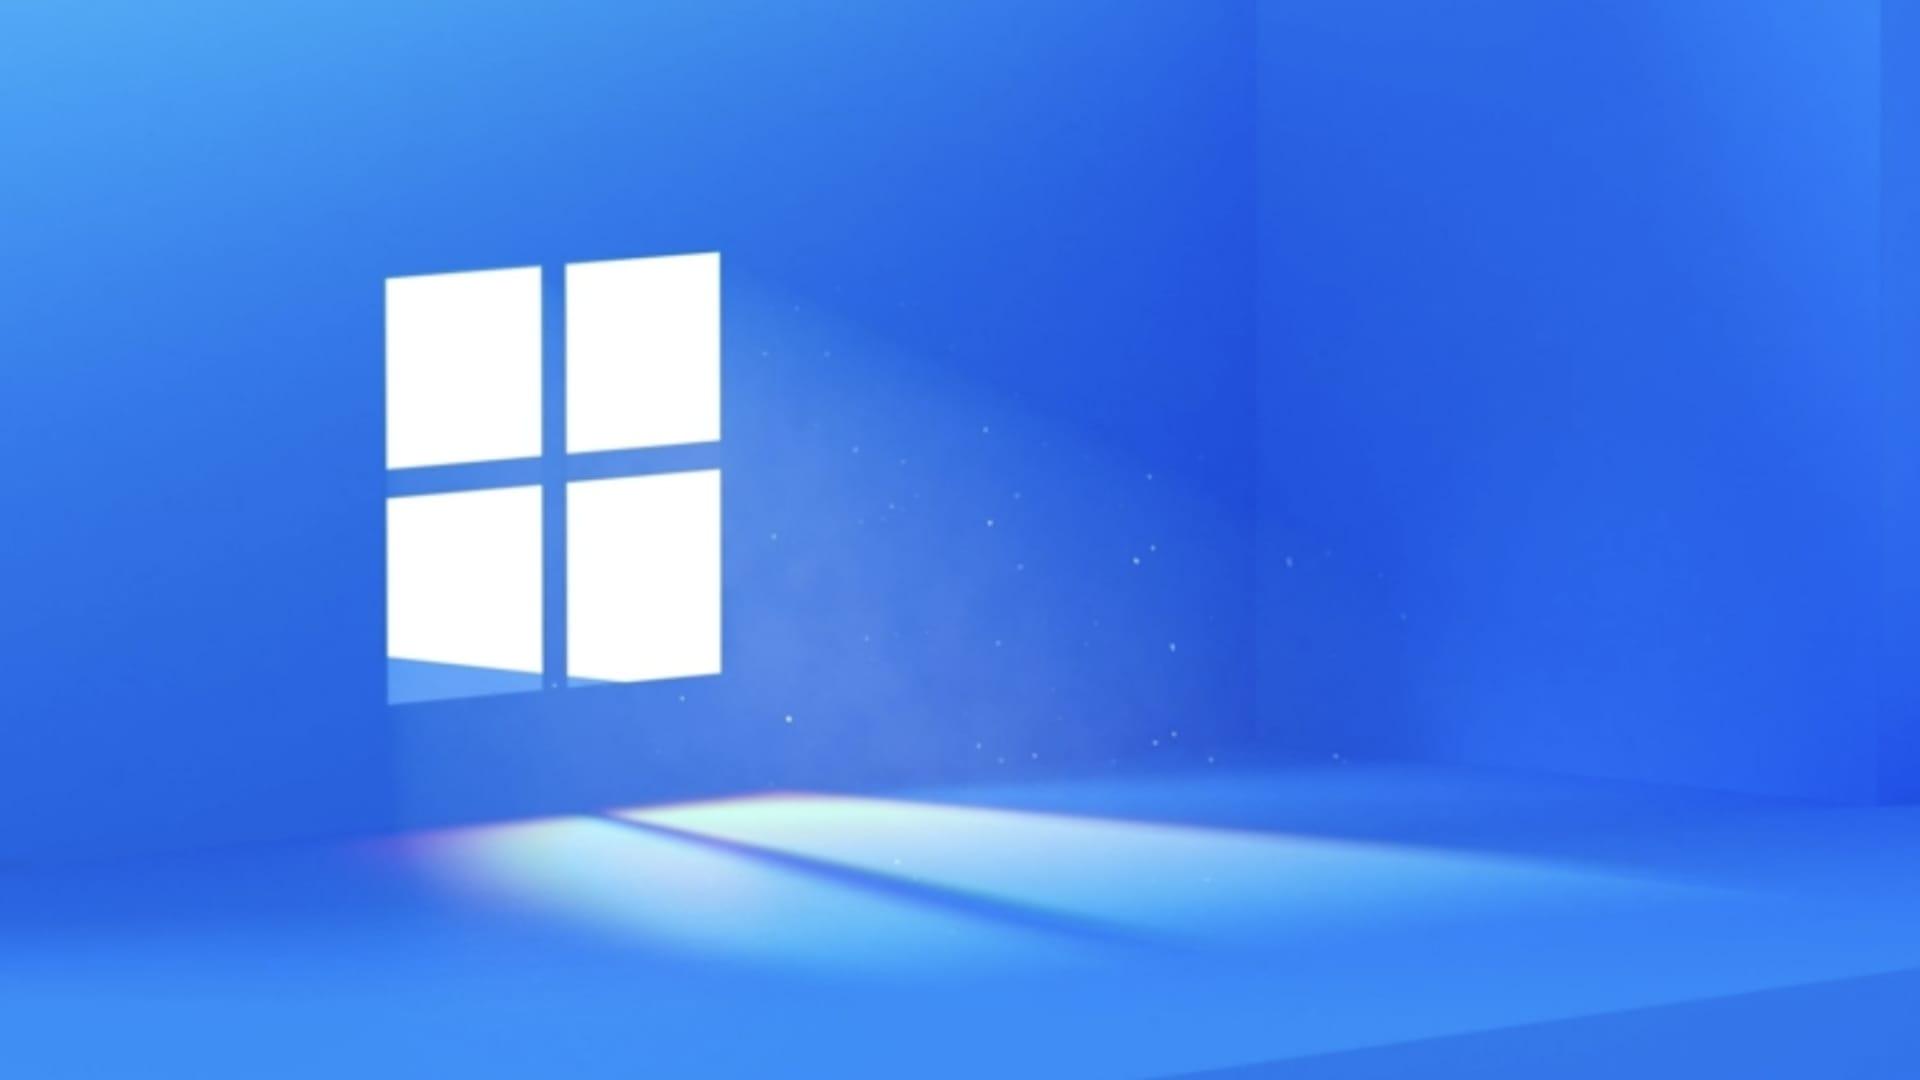 Windows 11 event